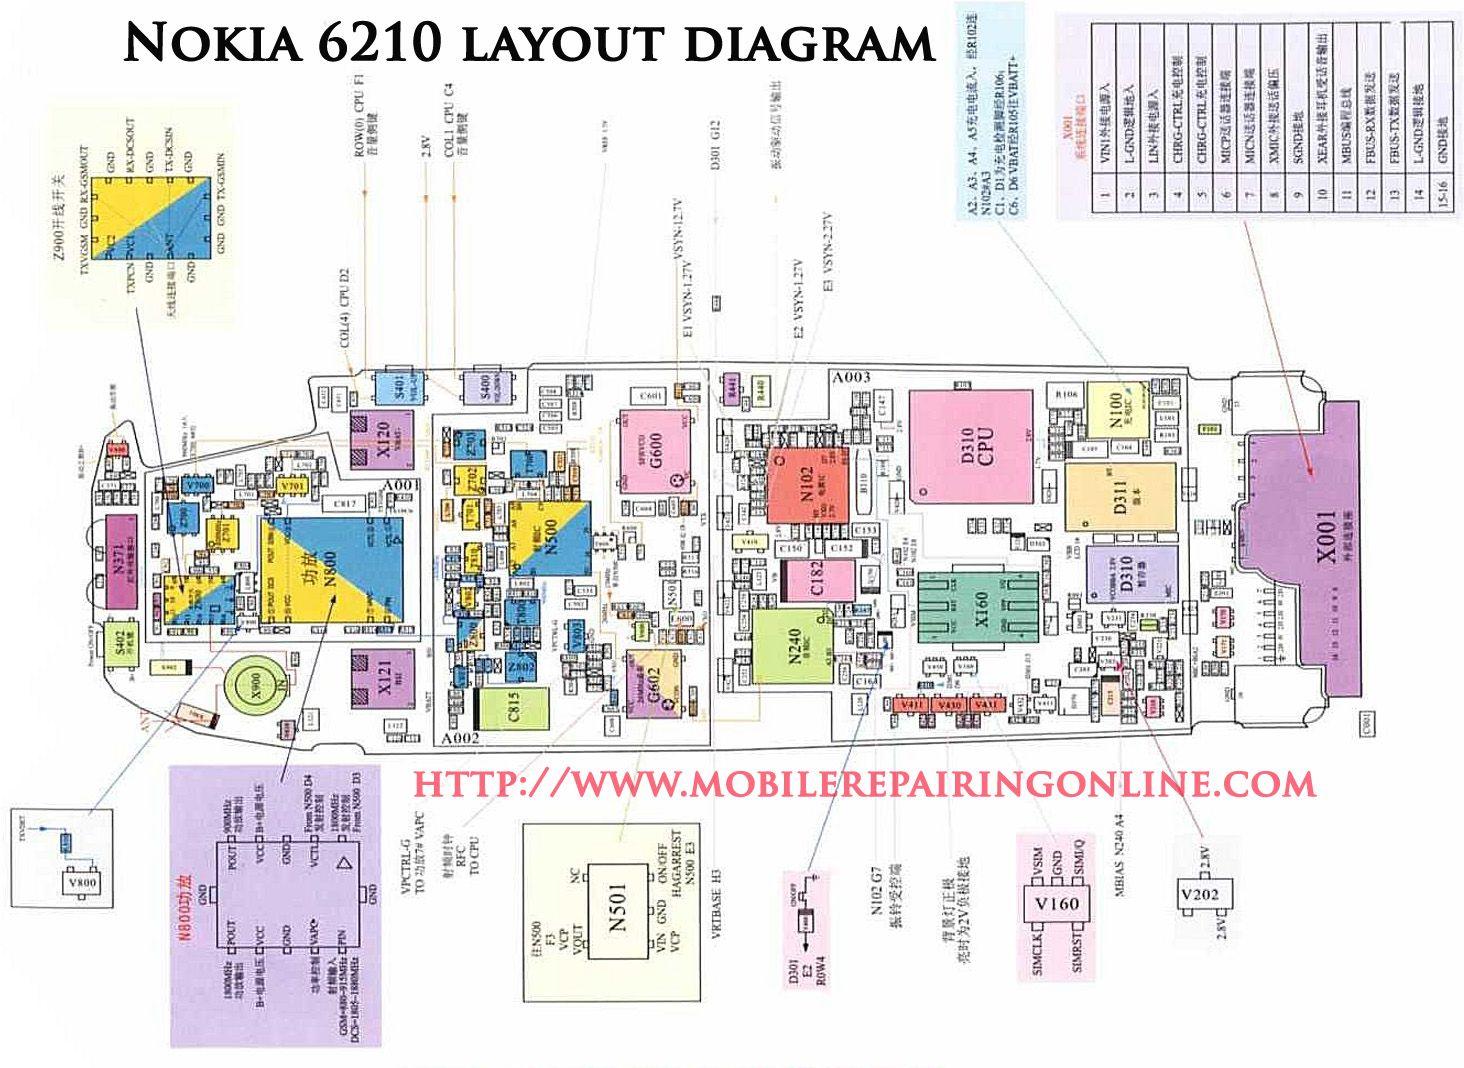 Nokia 6210 Layout Diagram 2 Jpg  1464 U00d71068